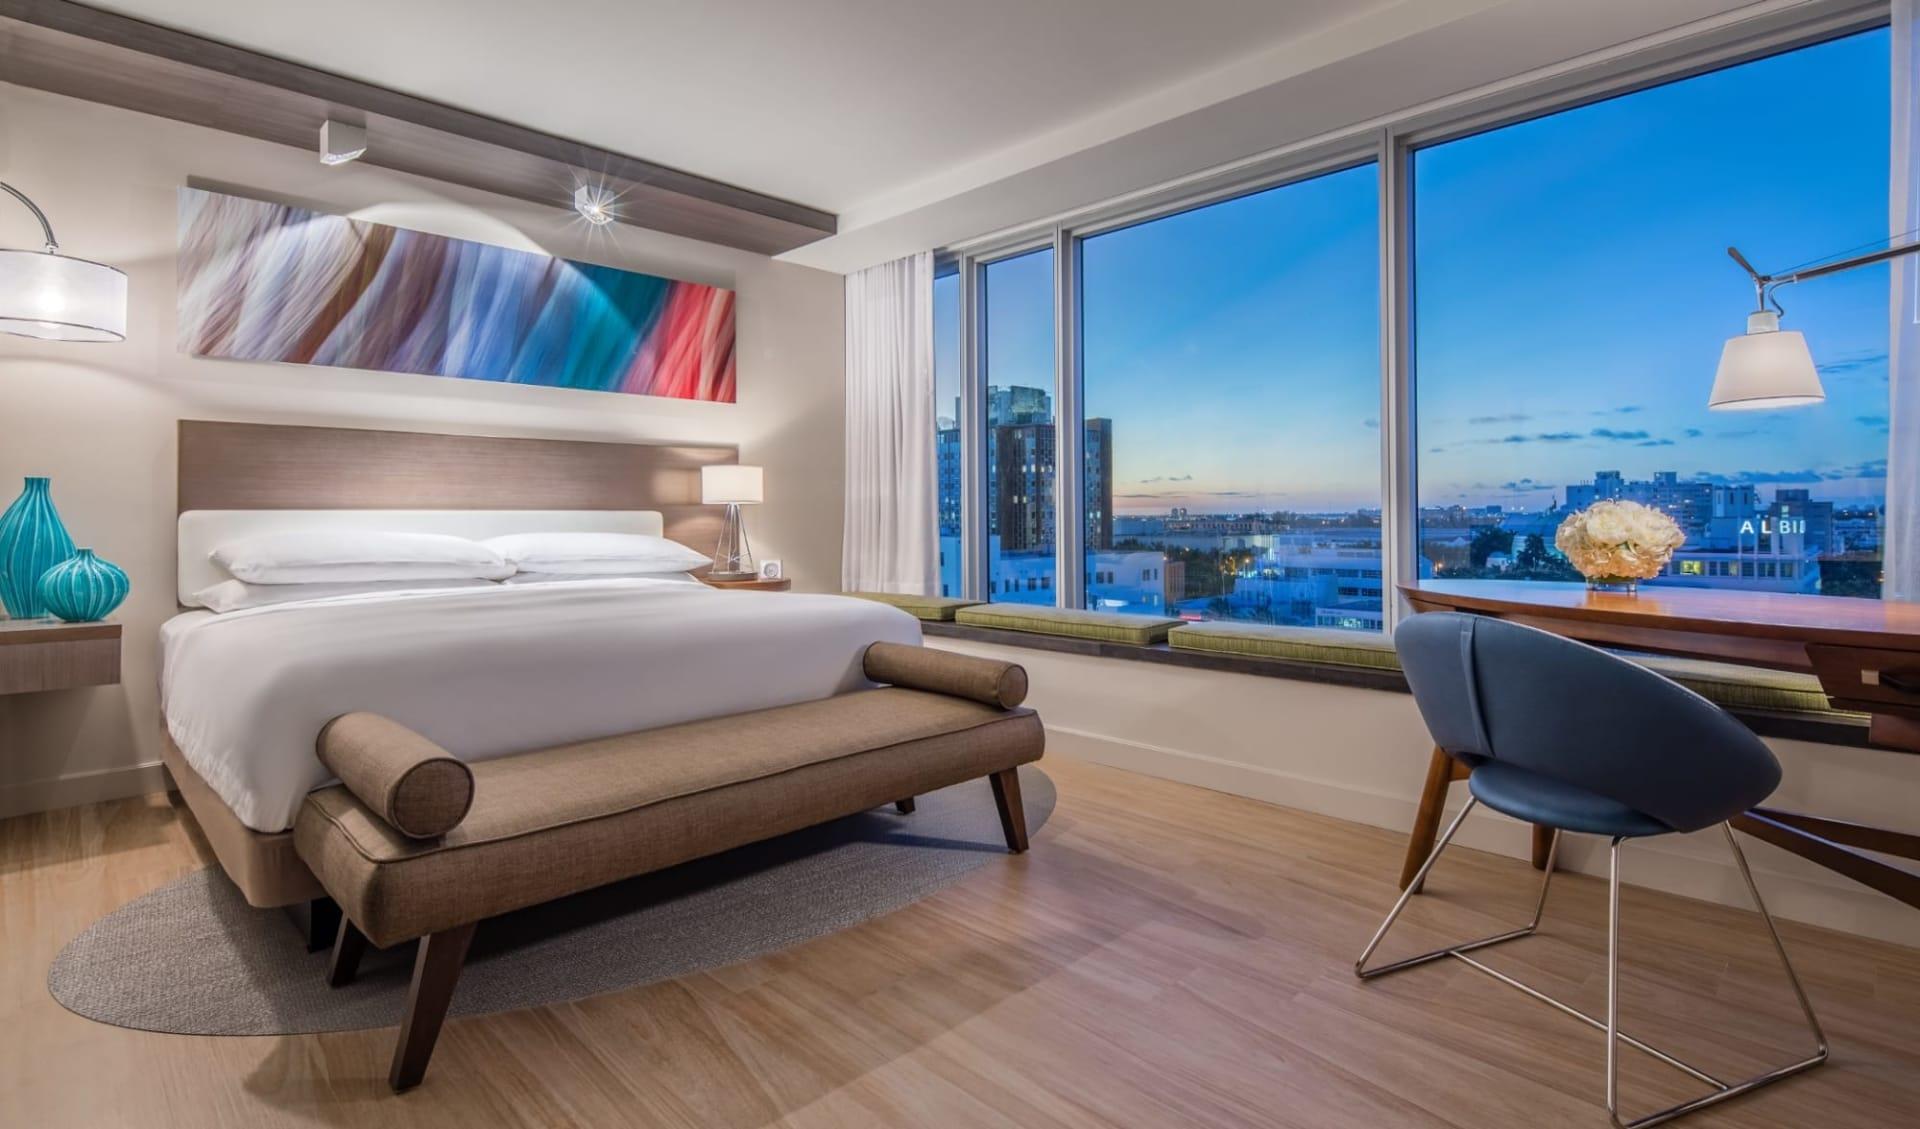 Hyatt Centric South Beach in Miami Beach:  Hyatt Centric South Beach - Standard Guest Room